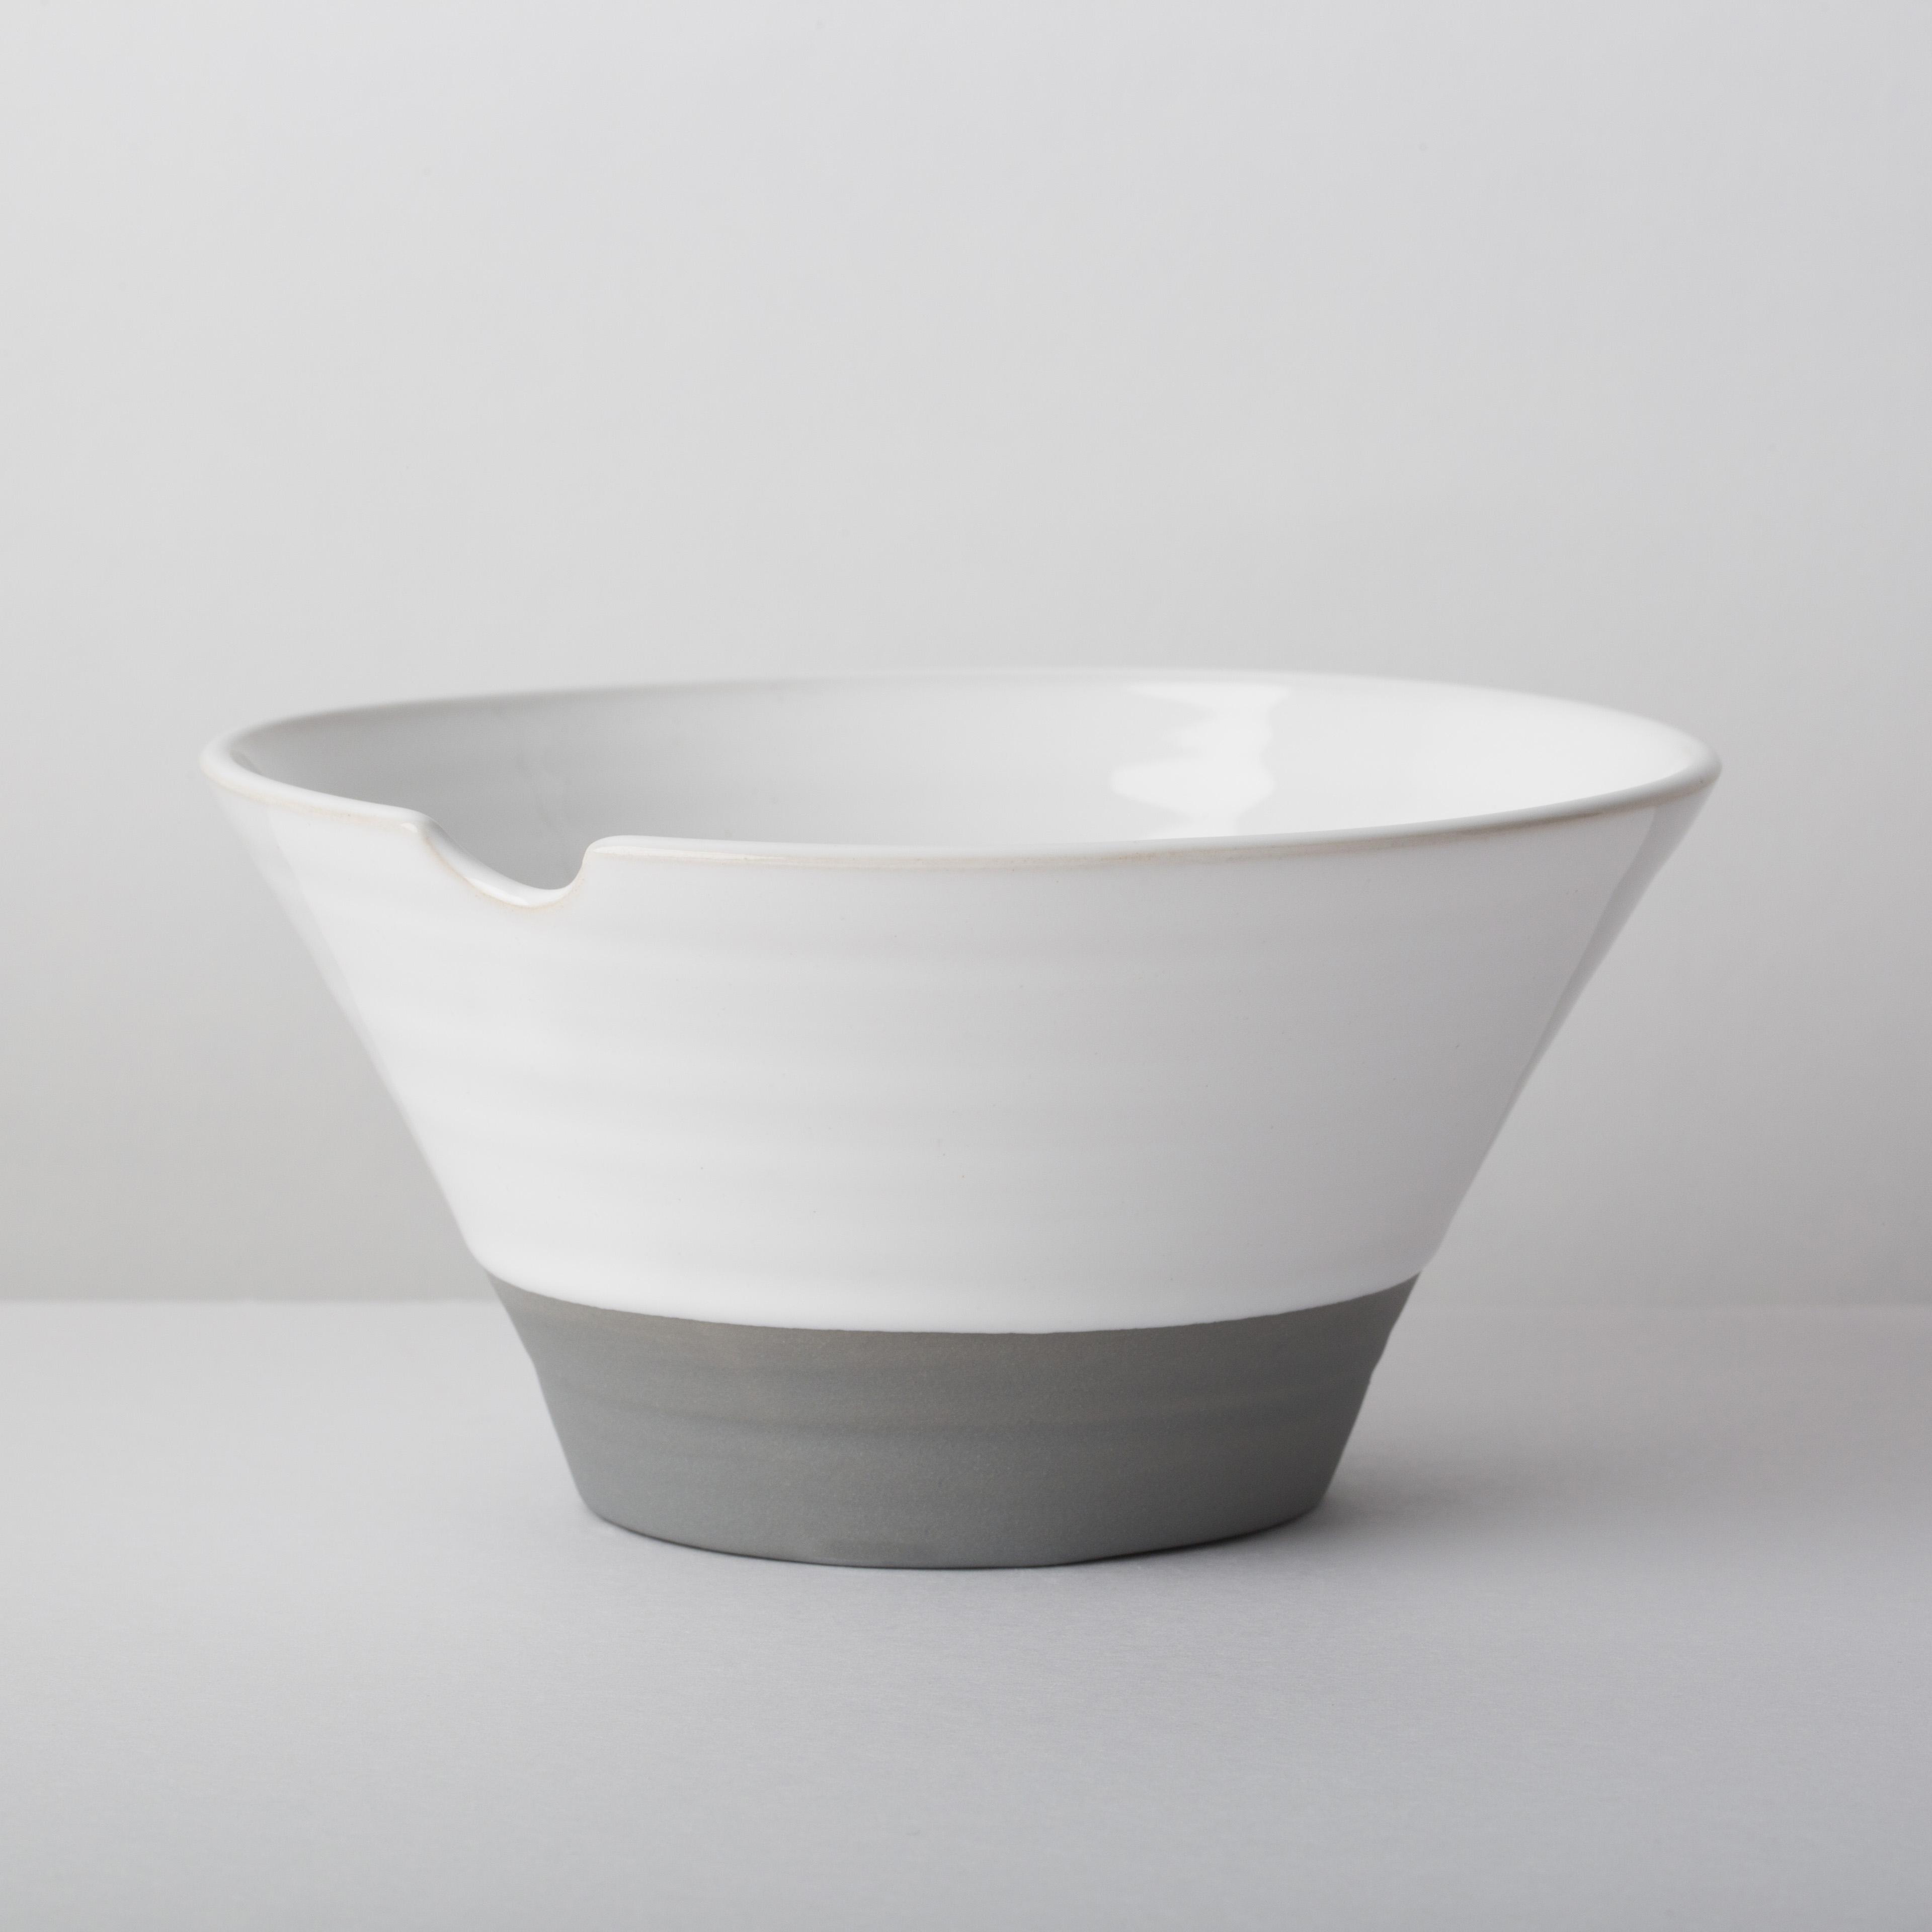 Diem Pottery Bowl Small Grey